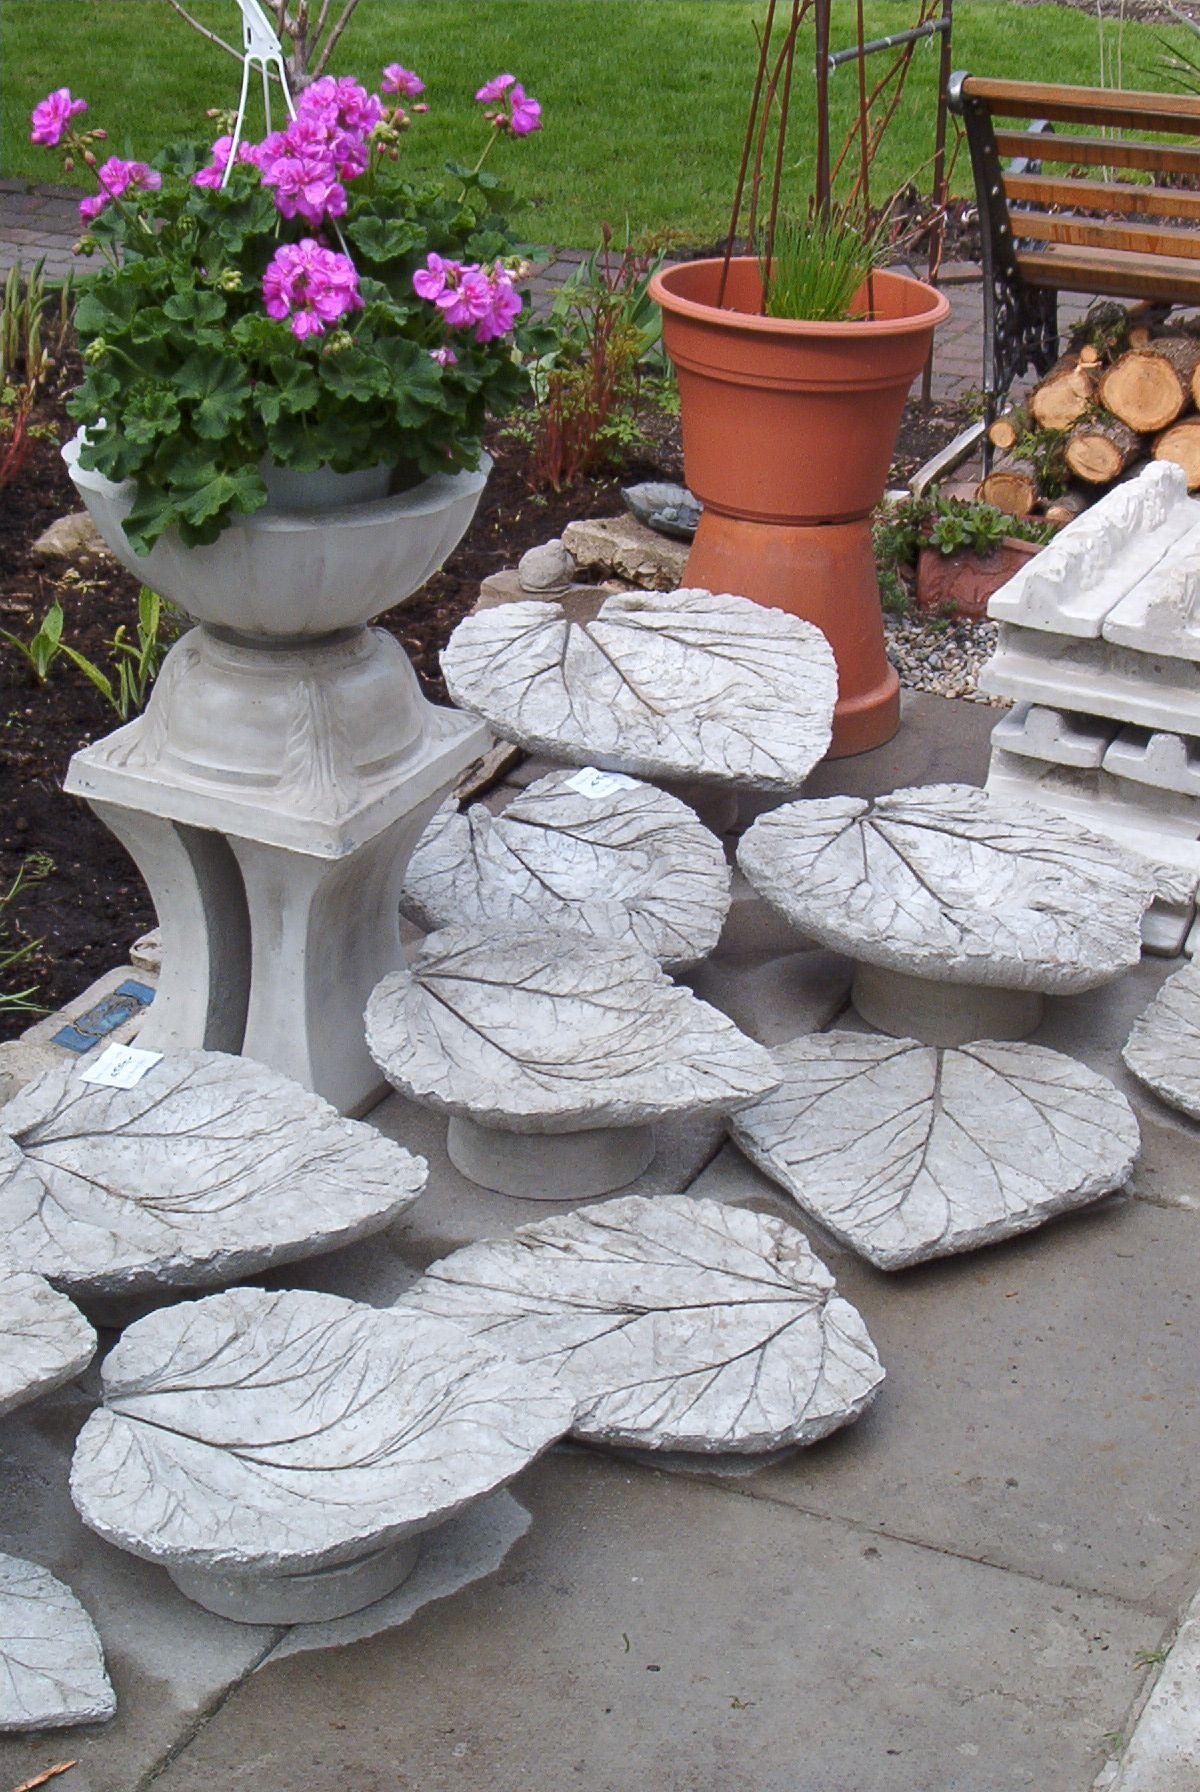 Déco de jardin DIY en béton – 33 belles idées   Gärten, Garten ideen ...